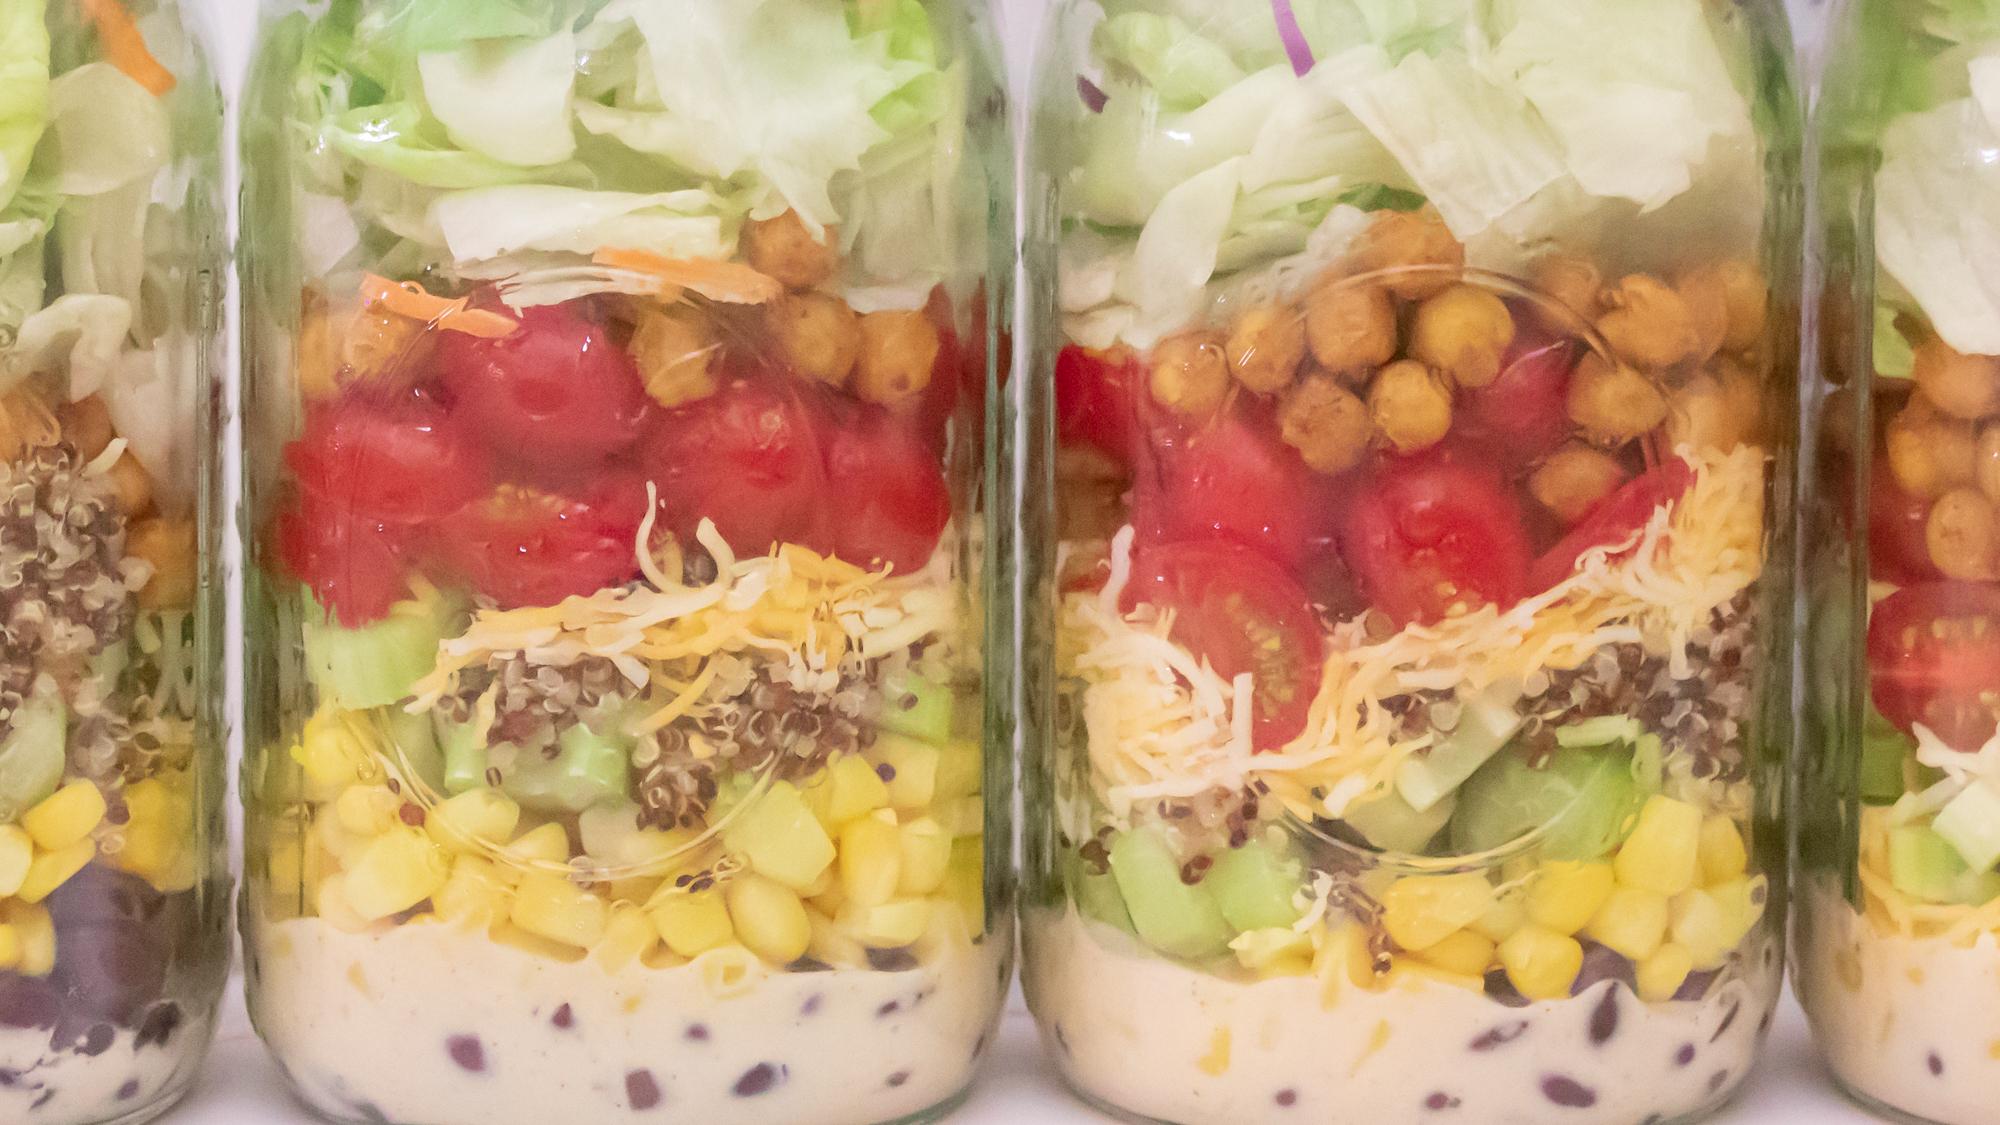 Southwest Jar Salad with Roasted Chickpeas Quinoa Main 1